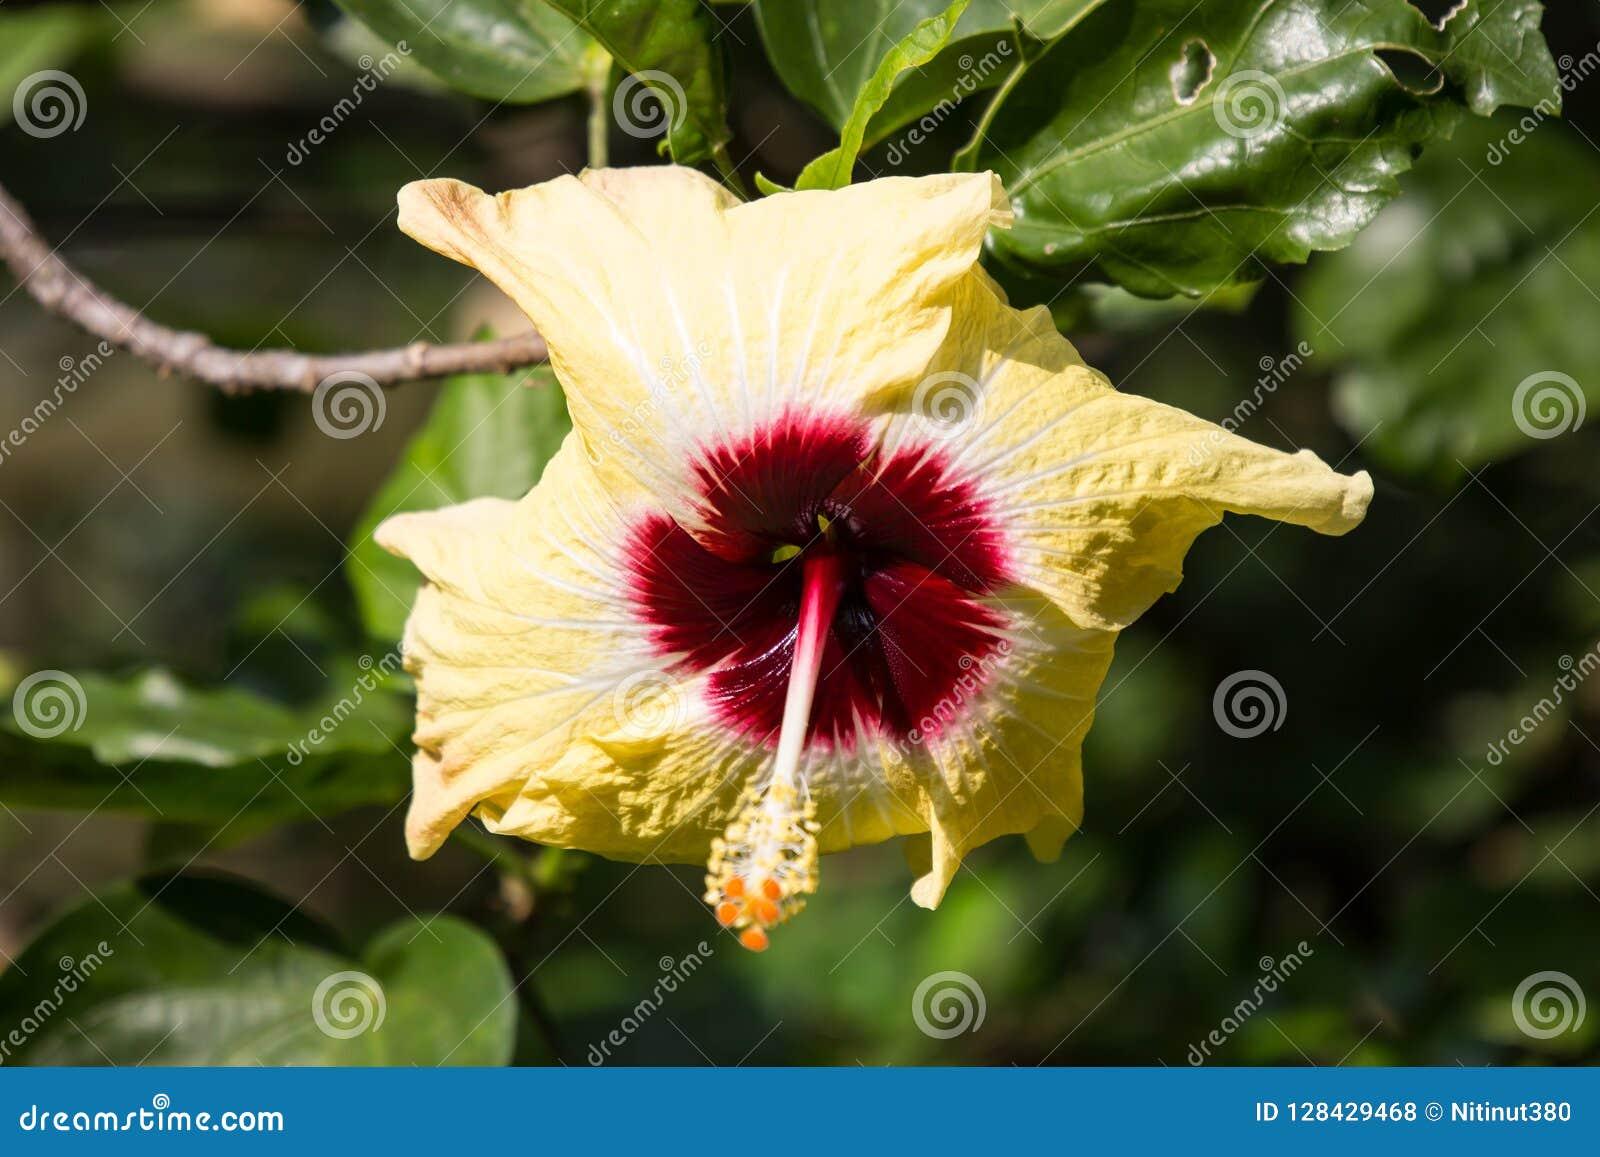 Yellow Hibiscus Flower In Black Dard Background Stock Photo Image